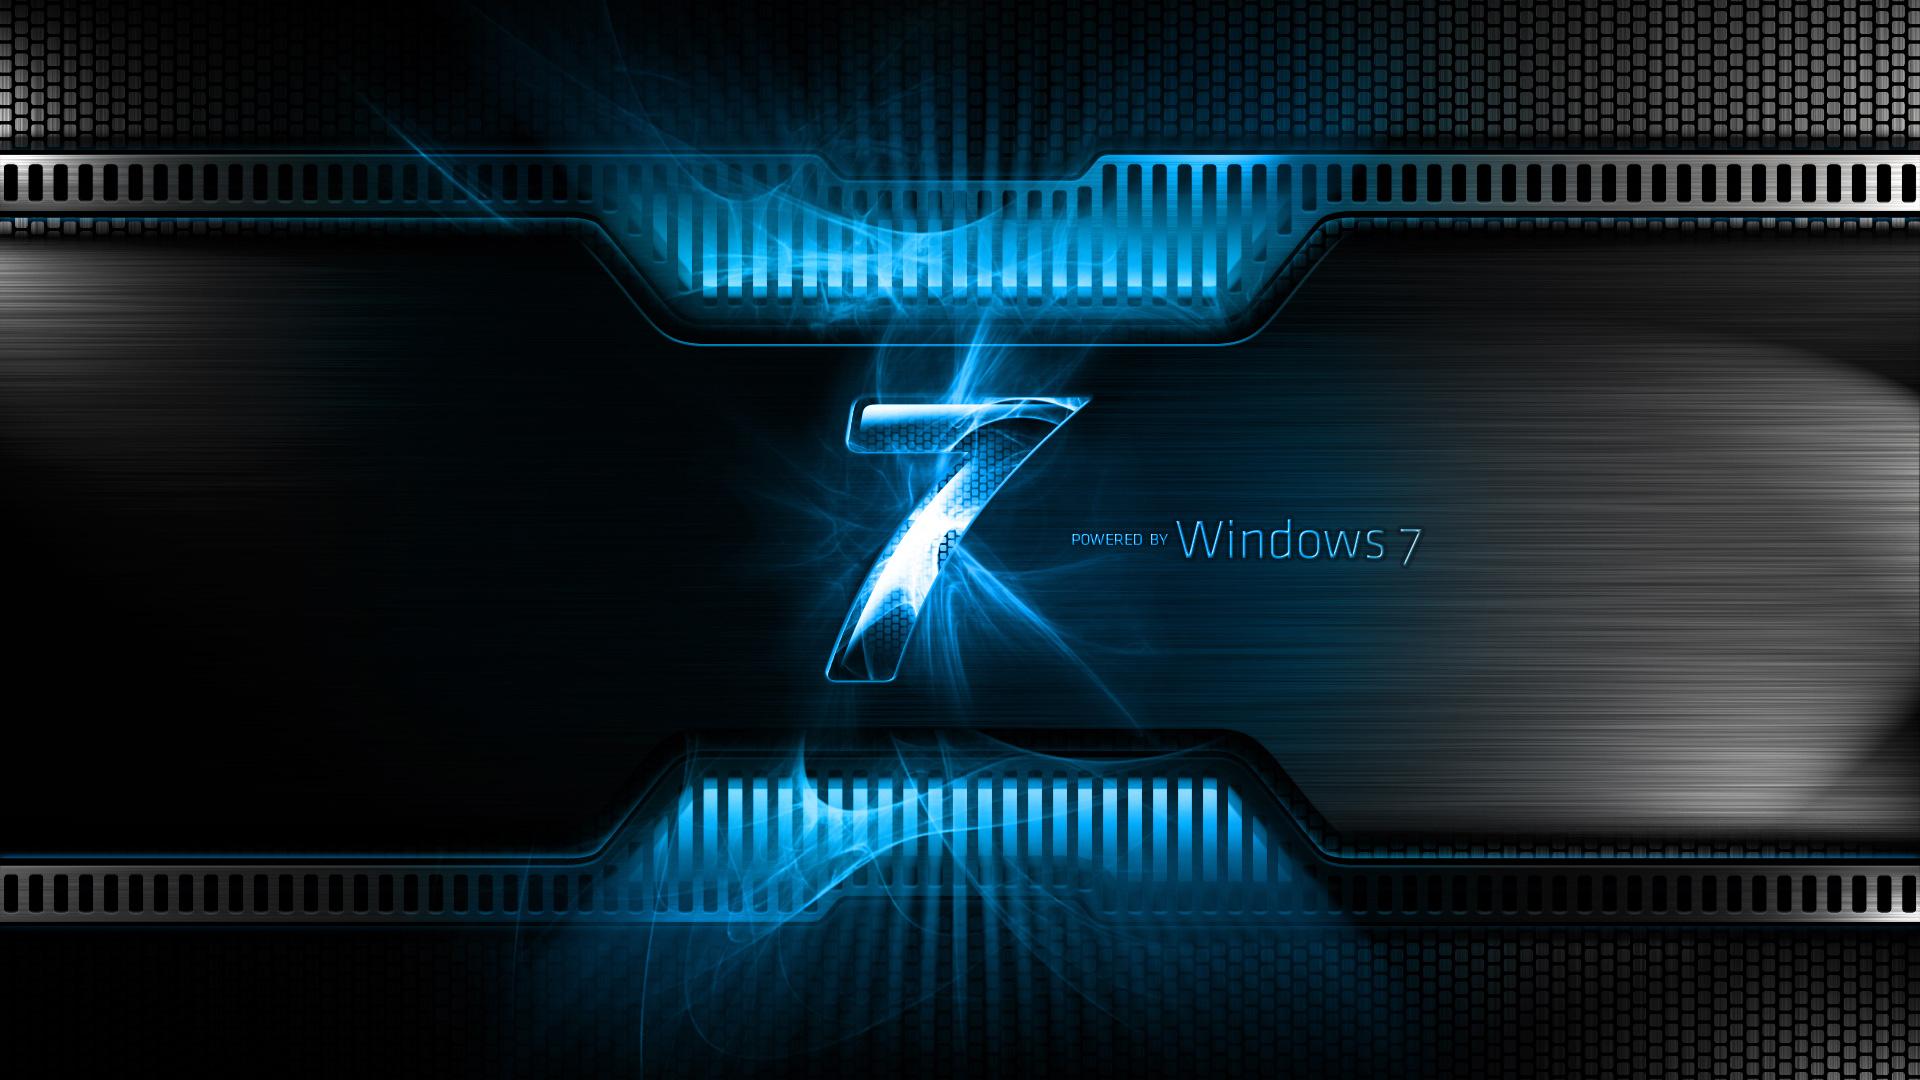 Windows 7 Power Wallpapers HD Wallpapers 1920x1080